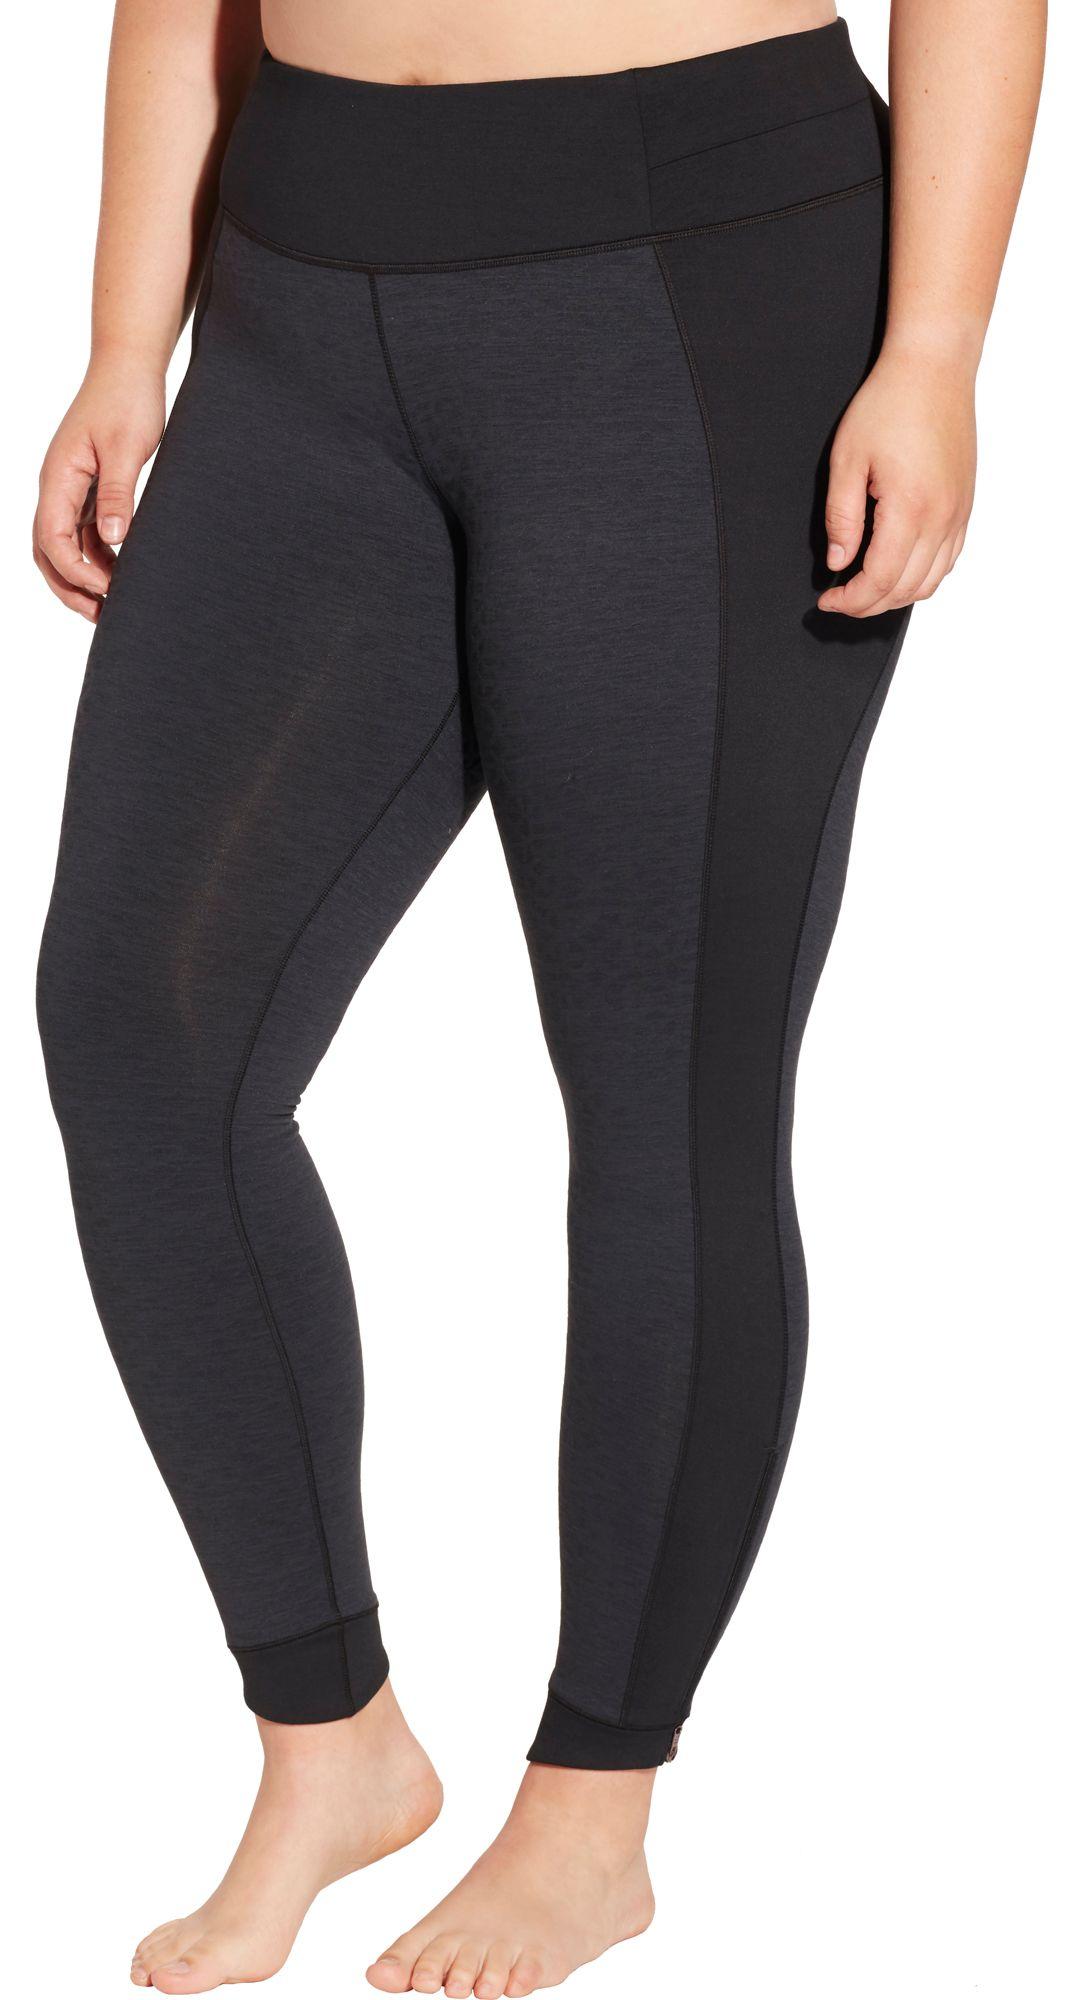 ee0a245b0b37 CALIA by Carrie Underwood Women's Plus Size Warm Embossed Leggings.  noImageFound. Previous. 1